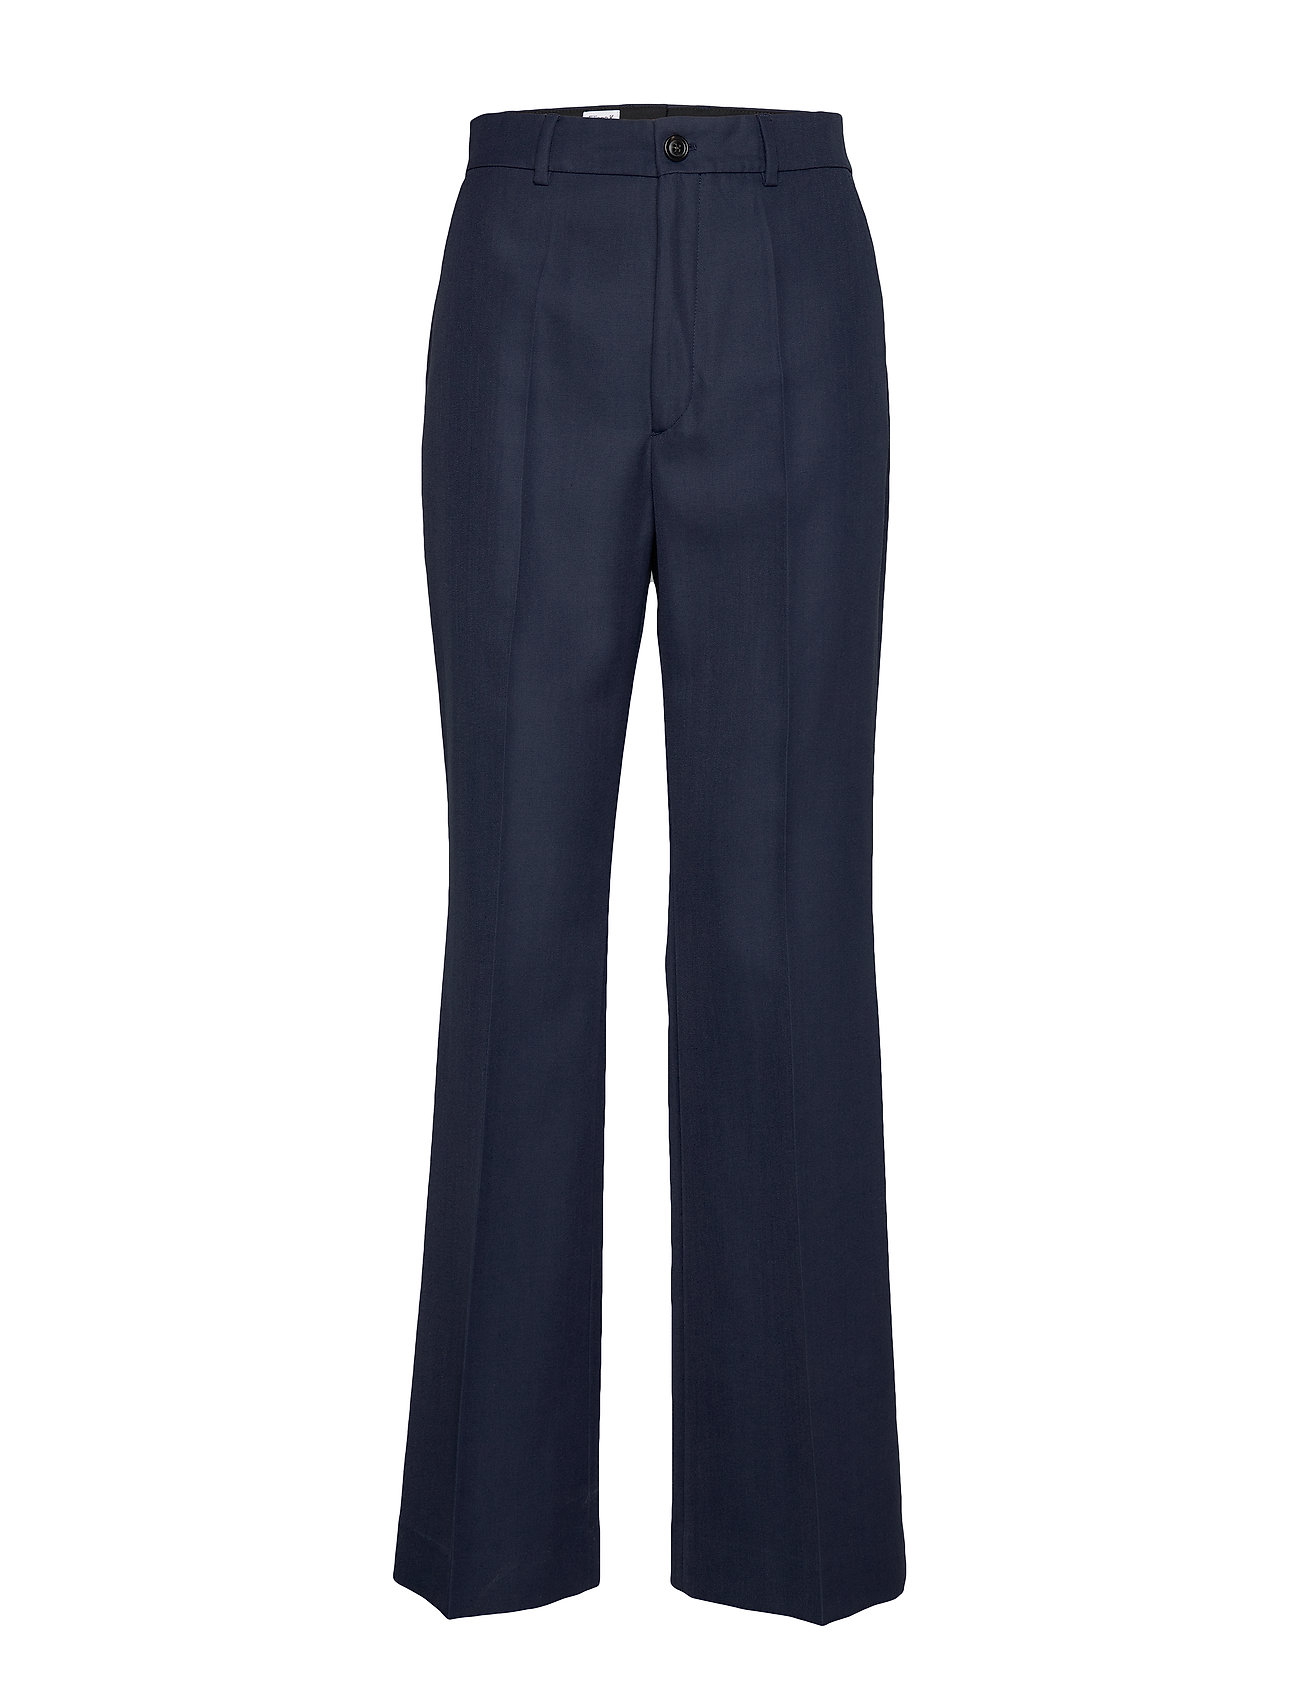 Image of Ivy Suiting Trouser Vide Bukser Blå Filippa K (3232787469)